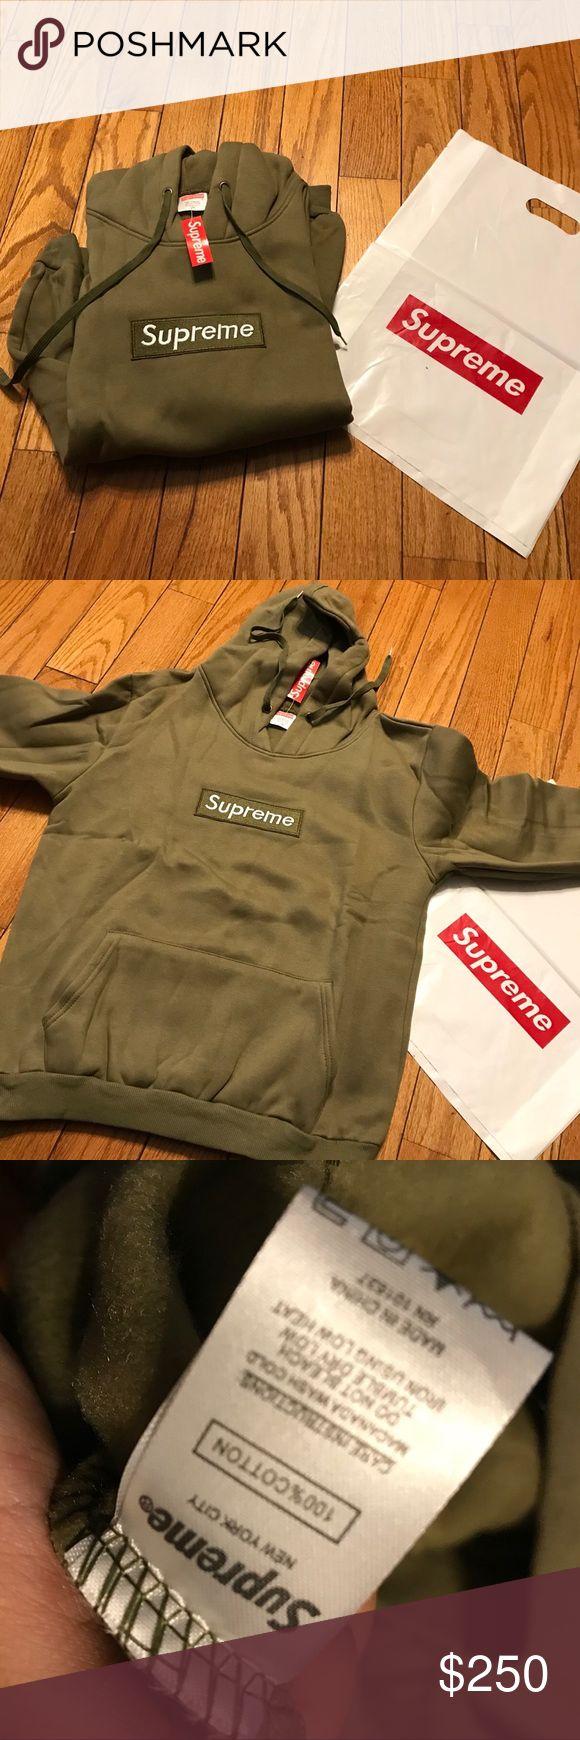 SUPREME BOX LOGO HOODIE new with tags supreme box logo hoodie SEE LAST PIC SIZING Supreme Sweaters